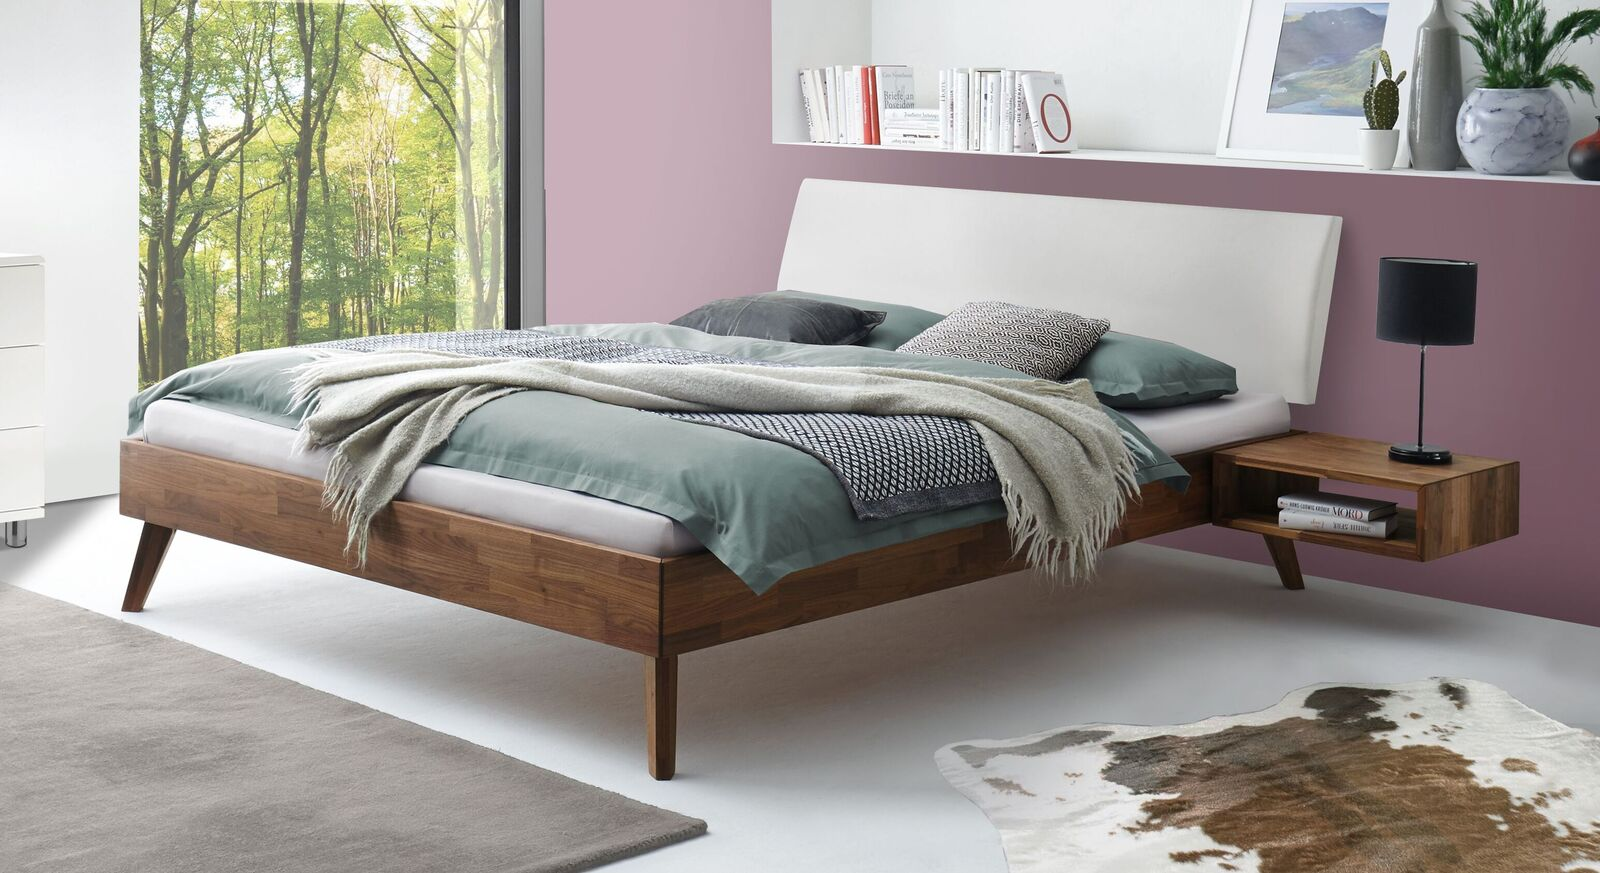 Bett Tomino aus massiver Nussbaum